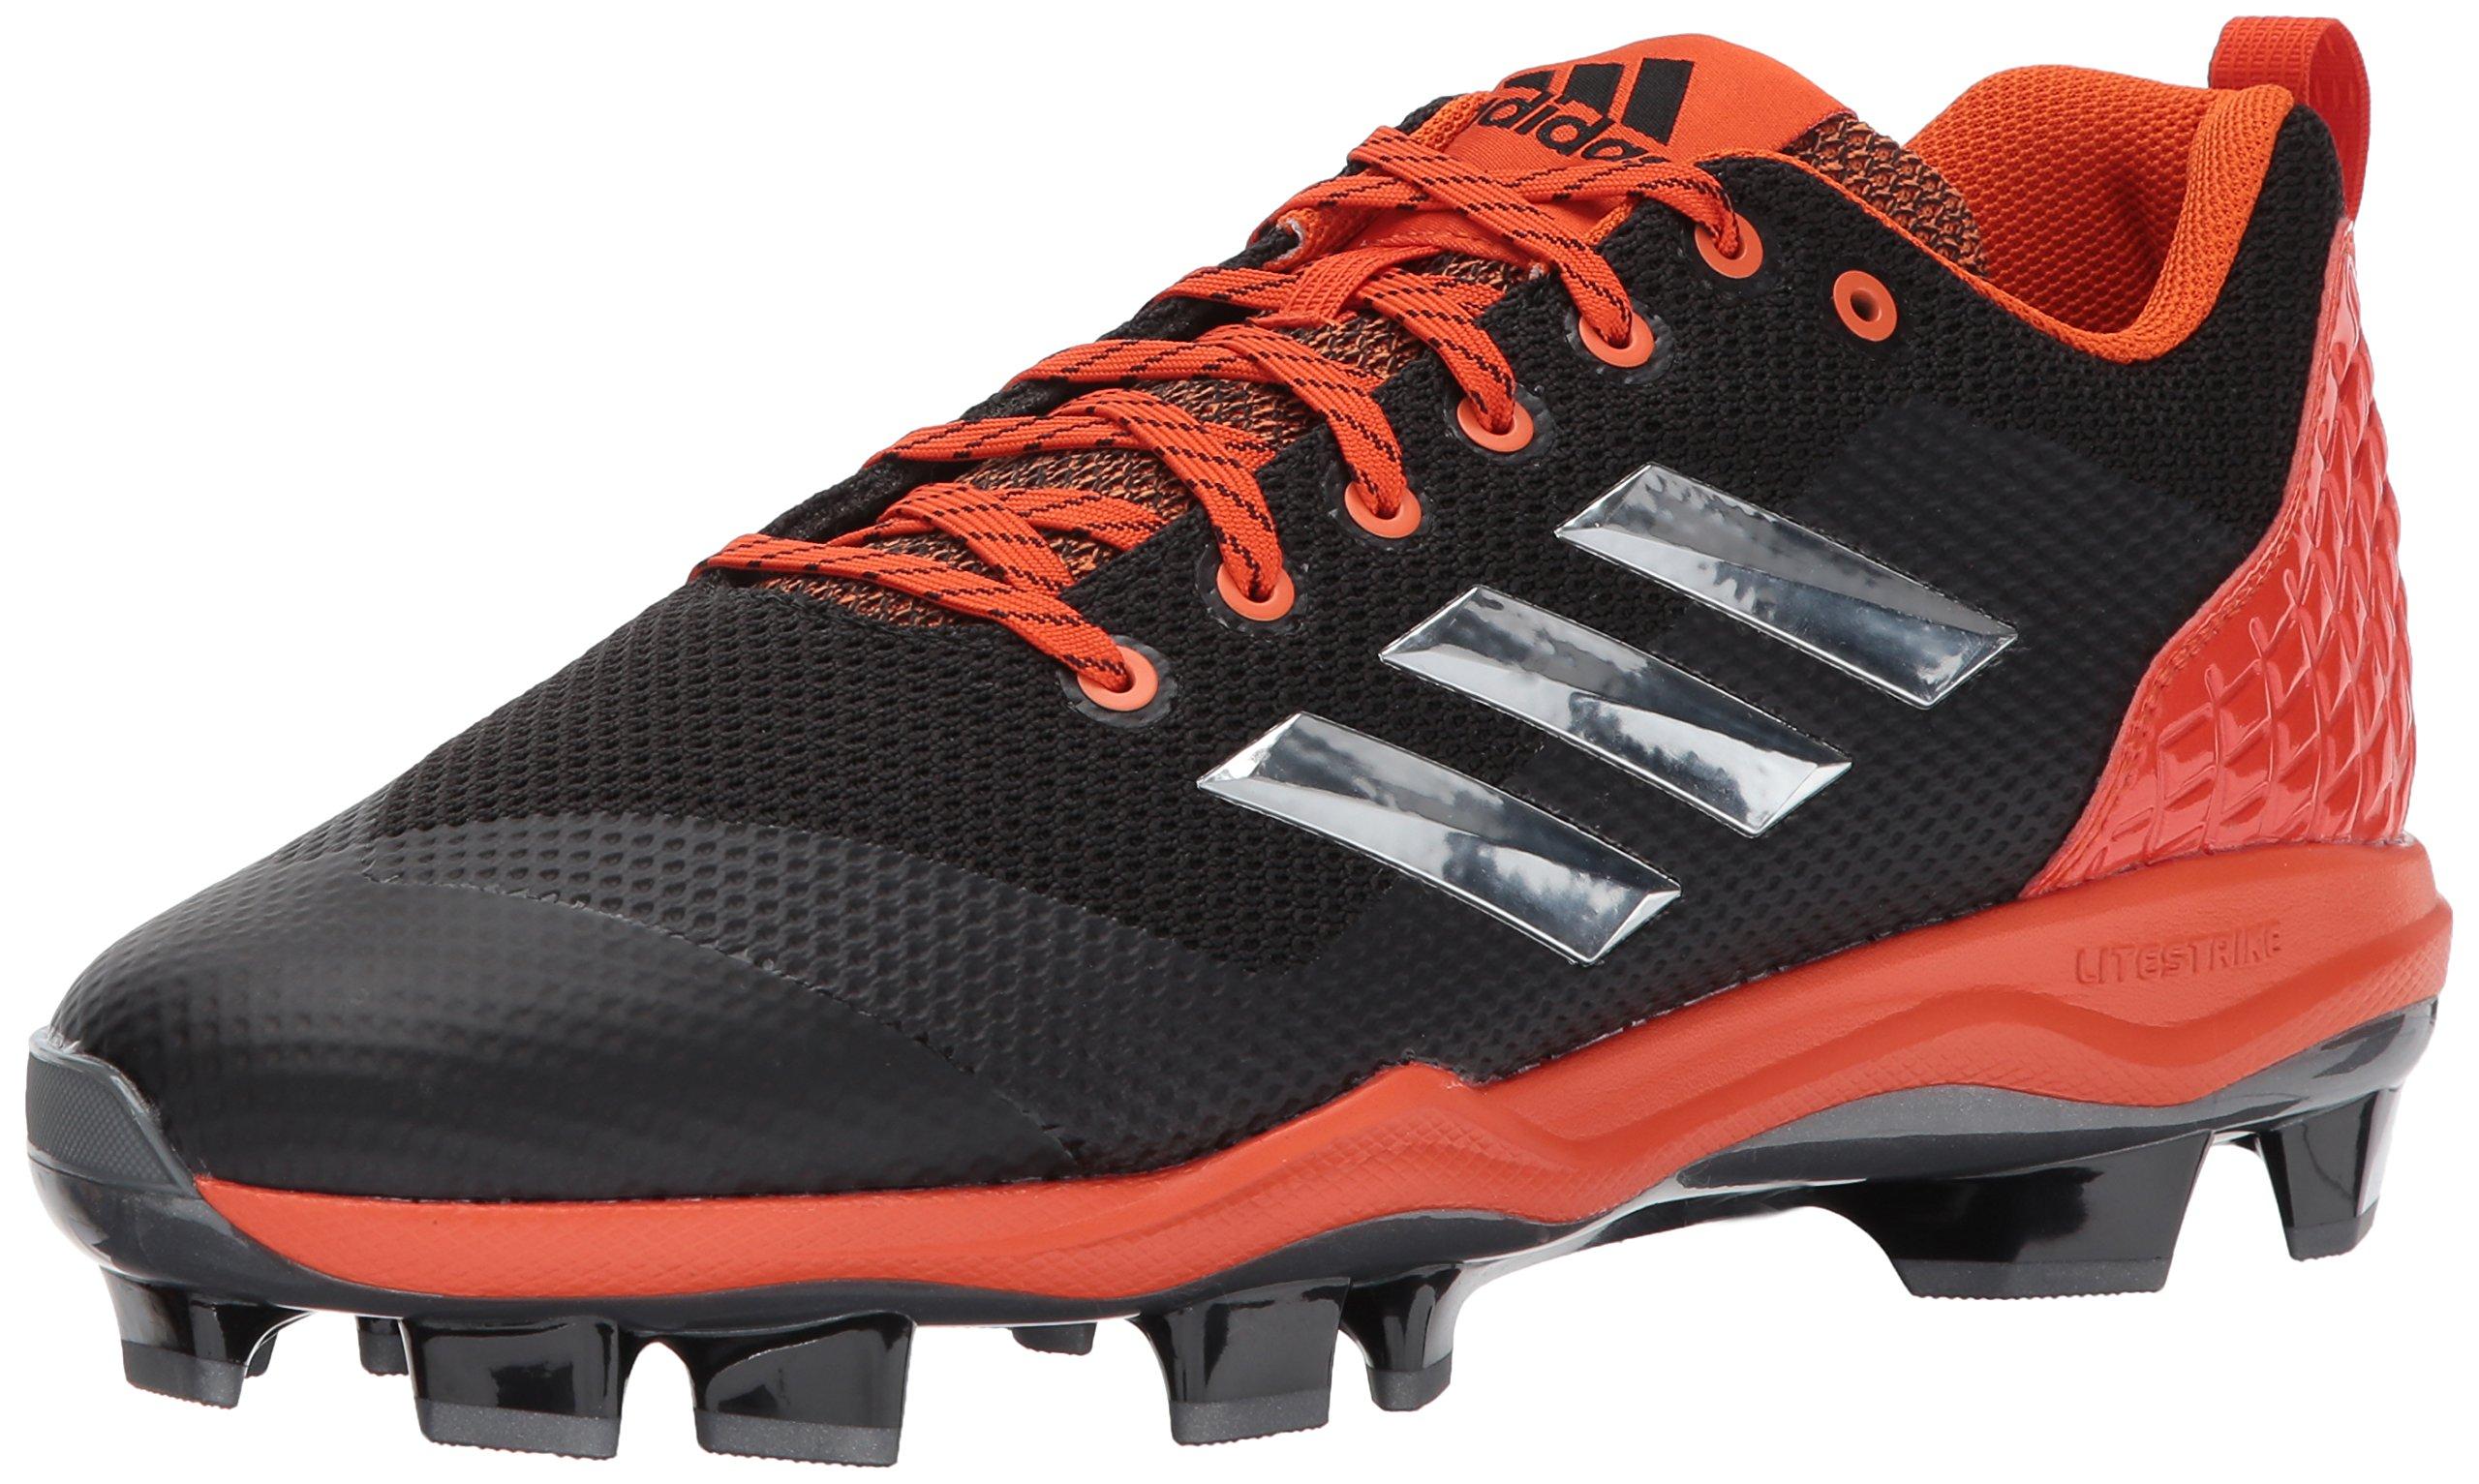 size 40 206c3 3f088 Galleon - Adidas Men s Freak X Carbon Mid Baseball Shoe, Core Black, Silver  Met, Collegiate Orange, 13 M US